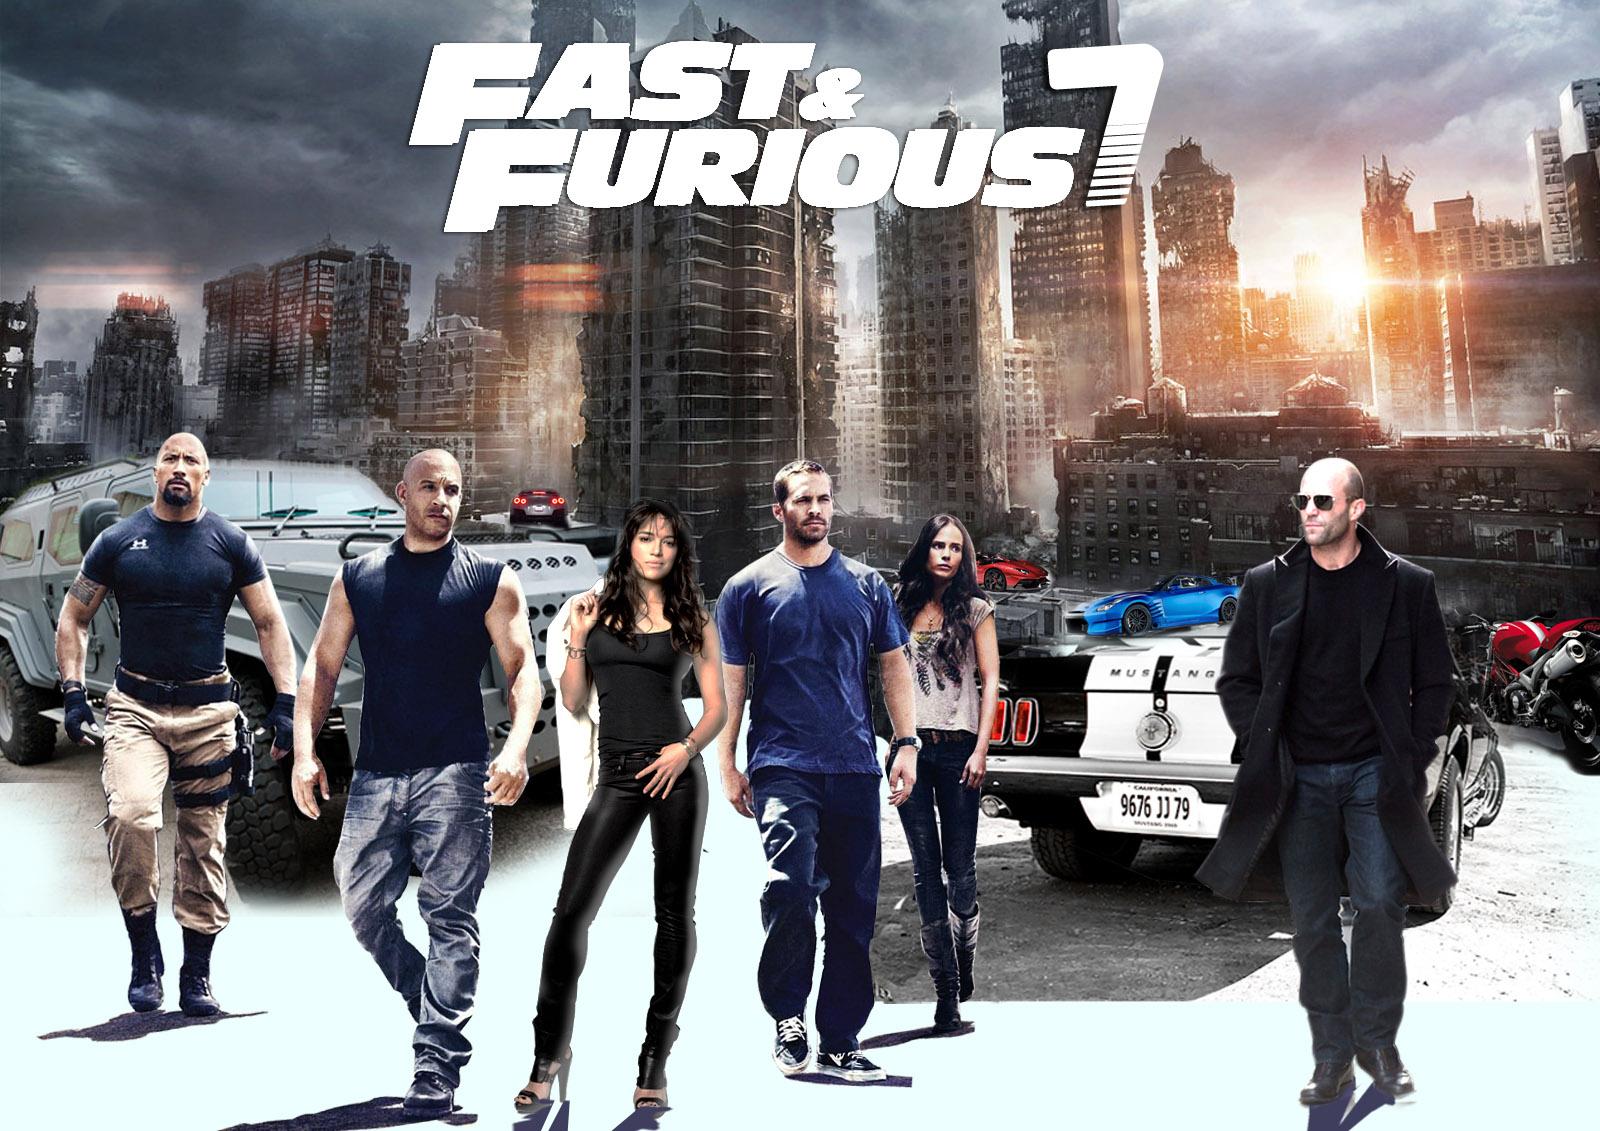 Fast And Furious 7 HD Wallpaper Download Desktop Wallpaper 1600x1131